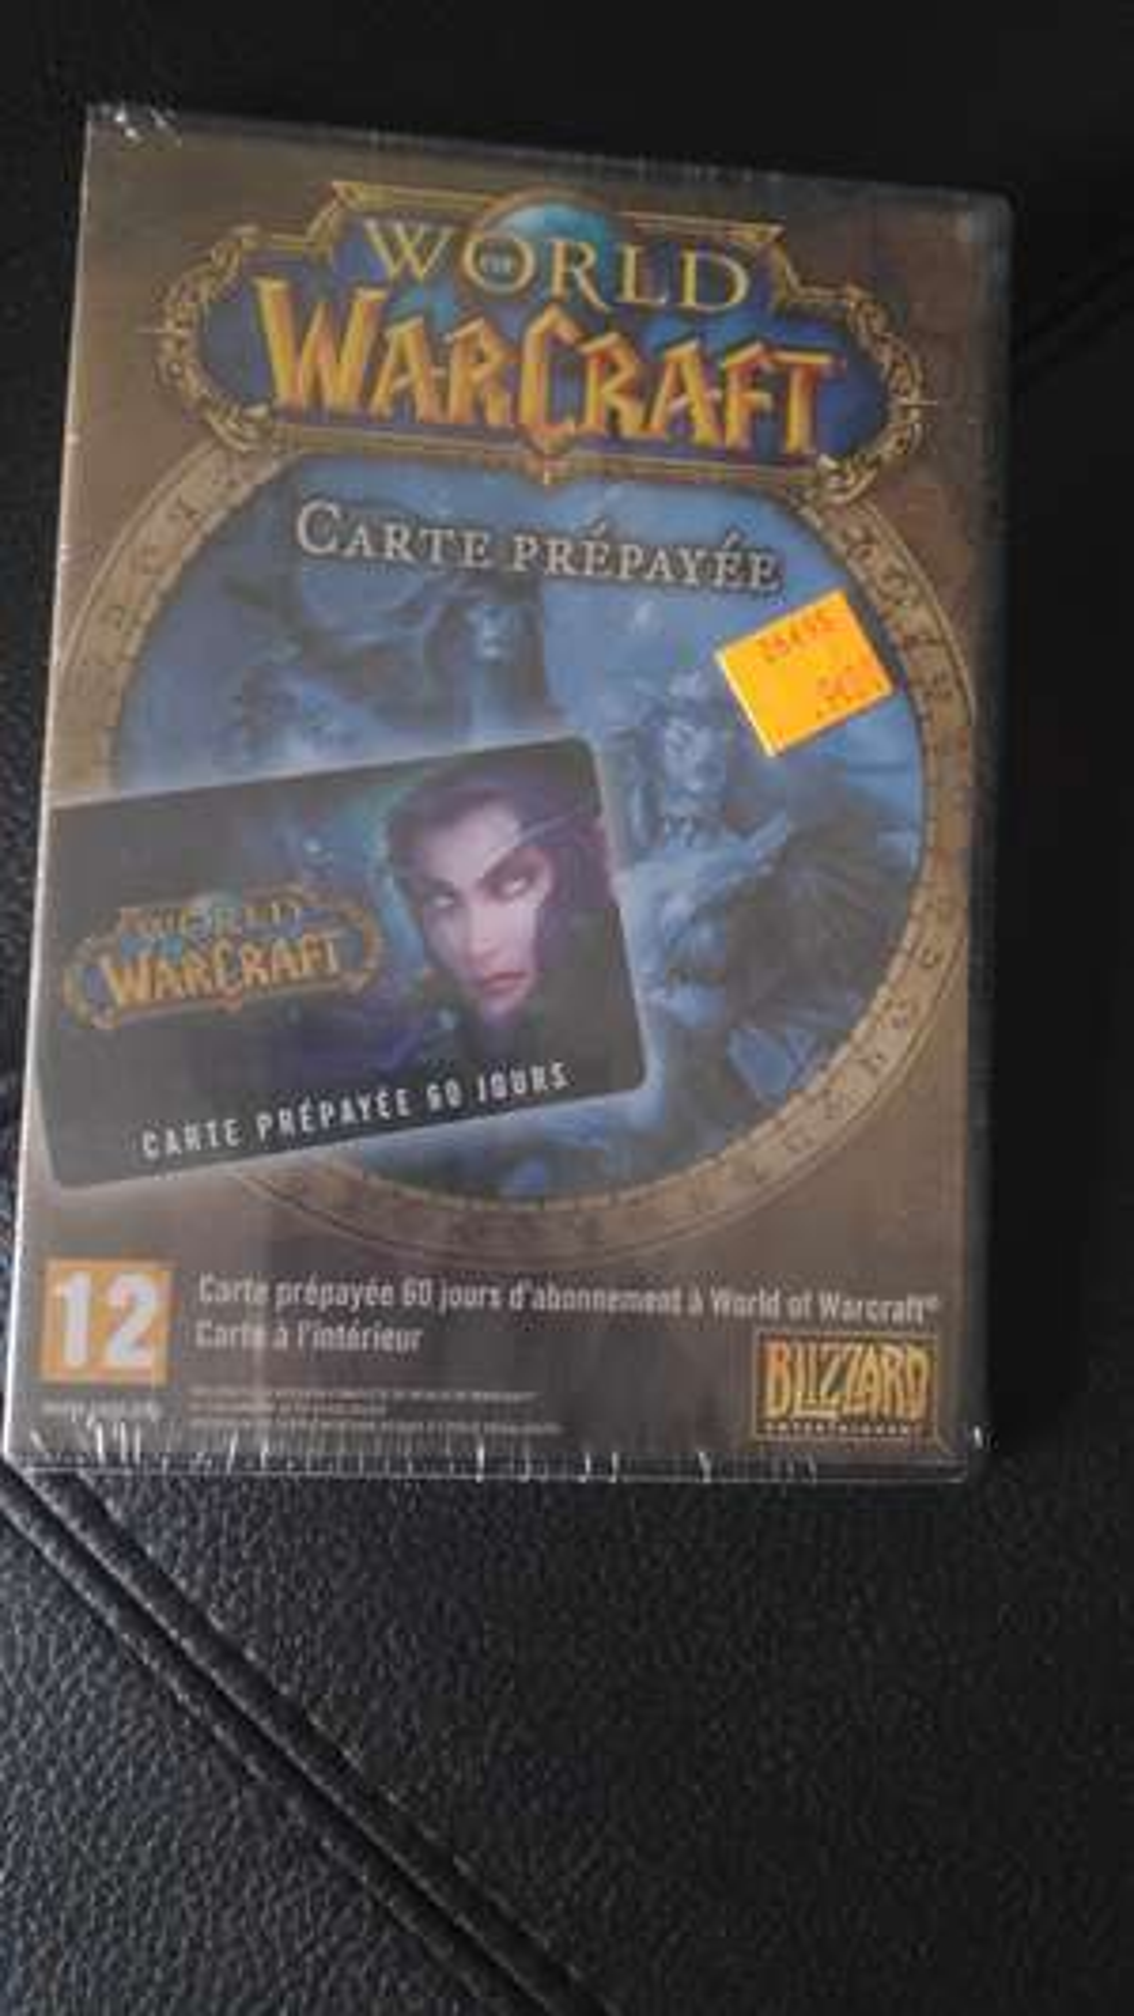 Abonnement pour World of Warcraft (60 jours) - Ivry-sur-Seine (94)